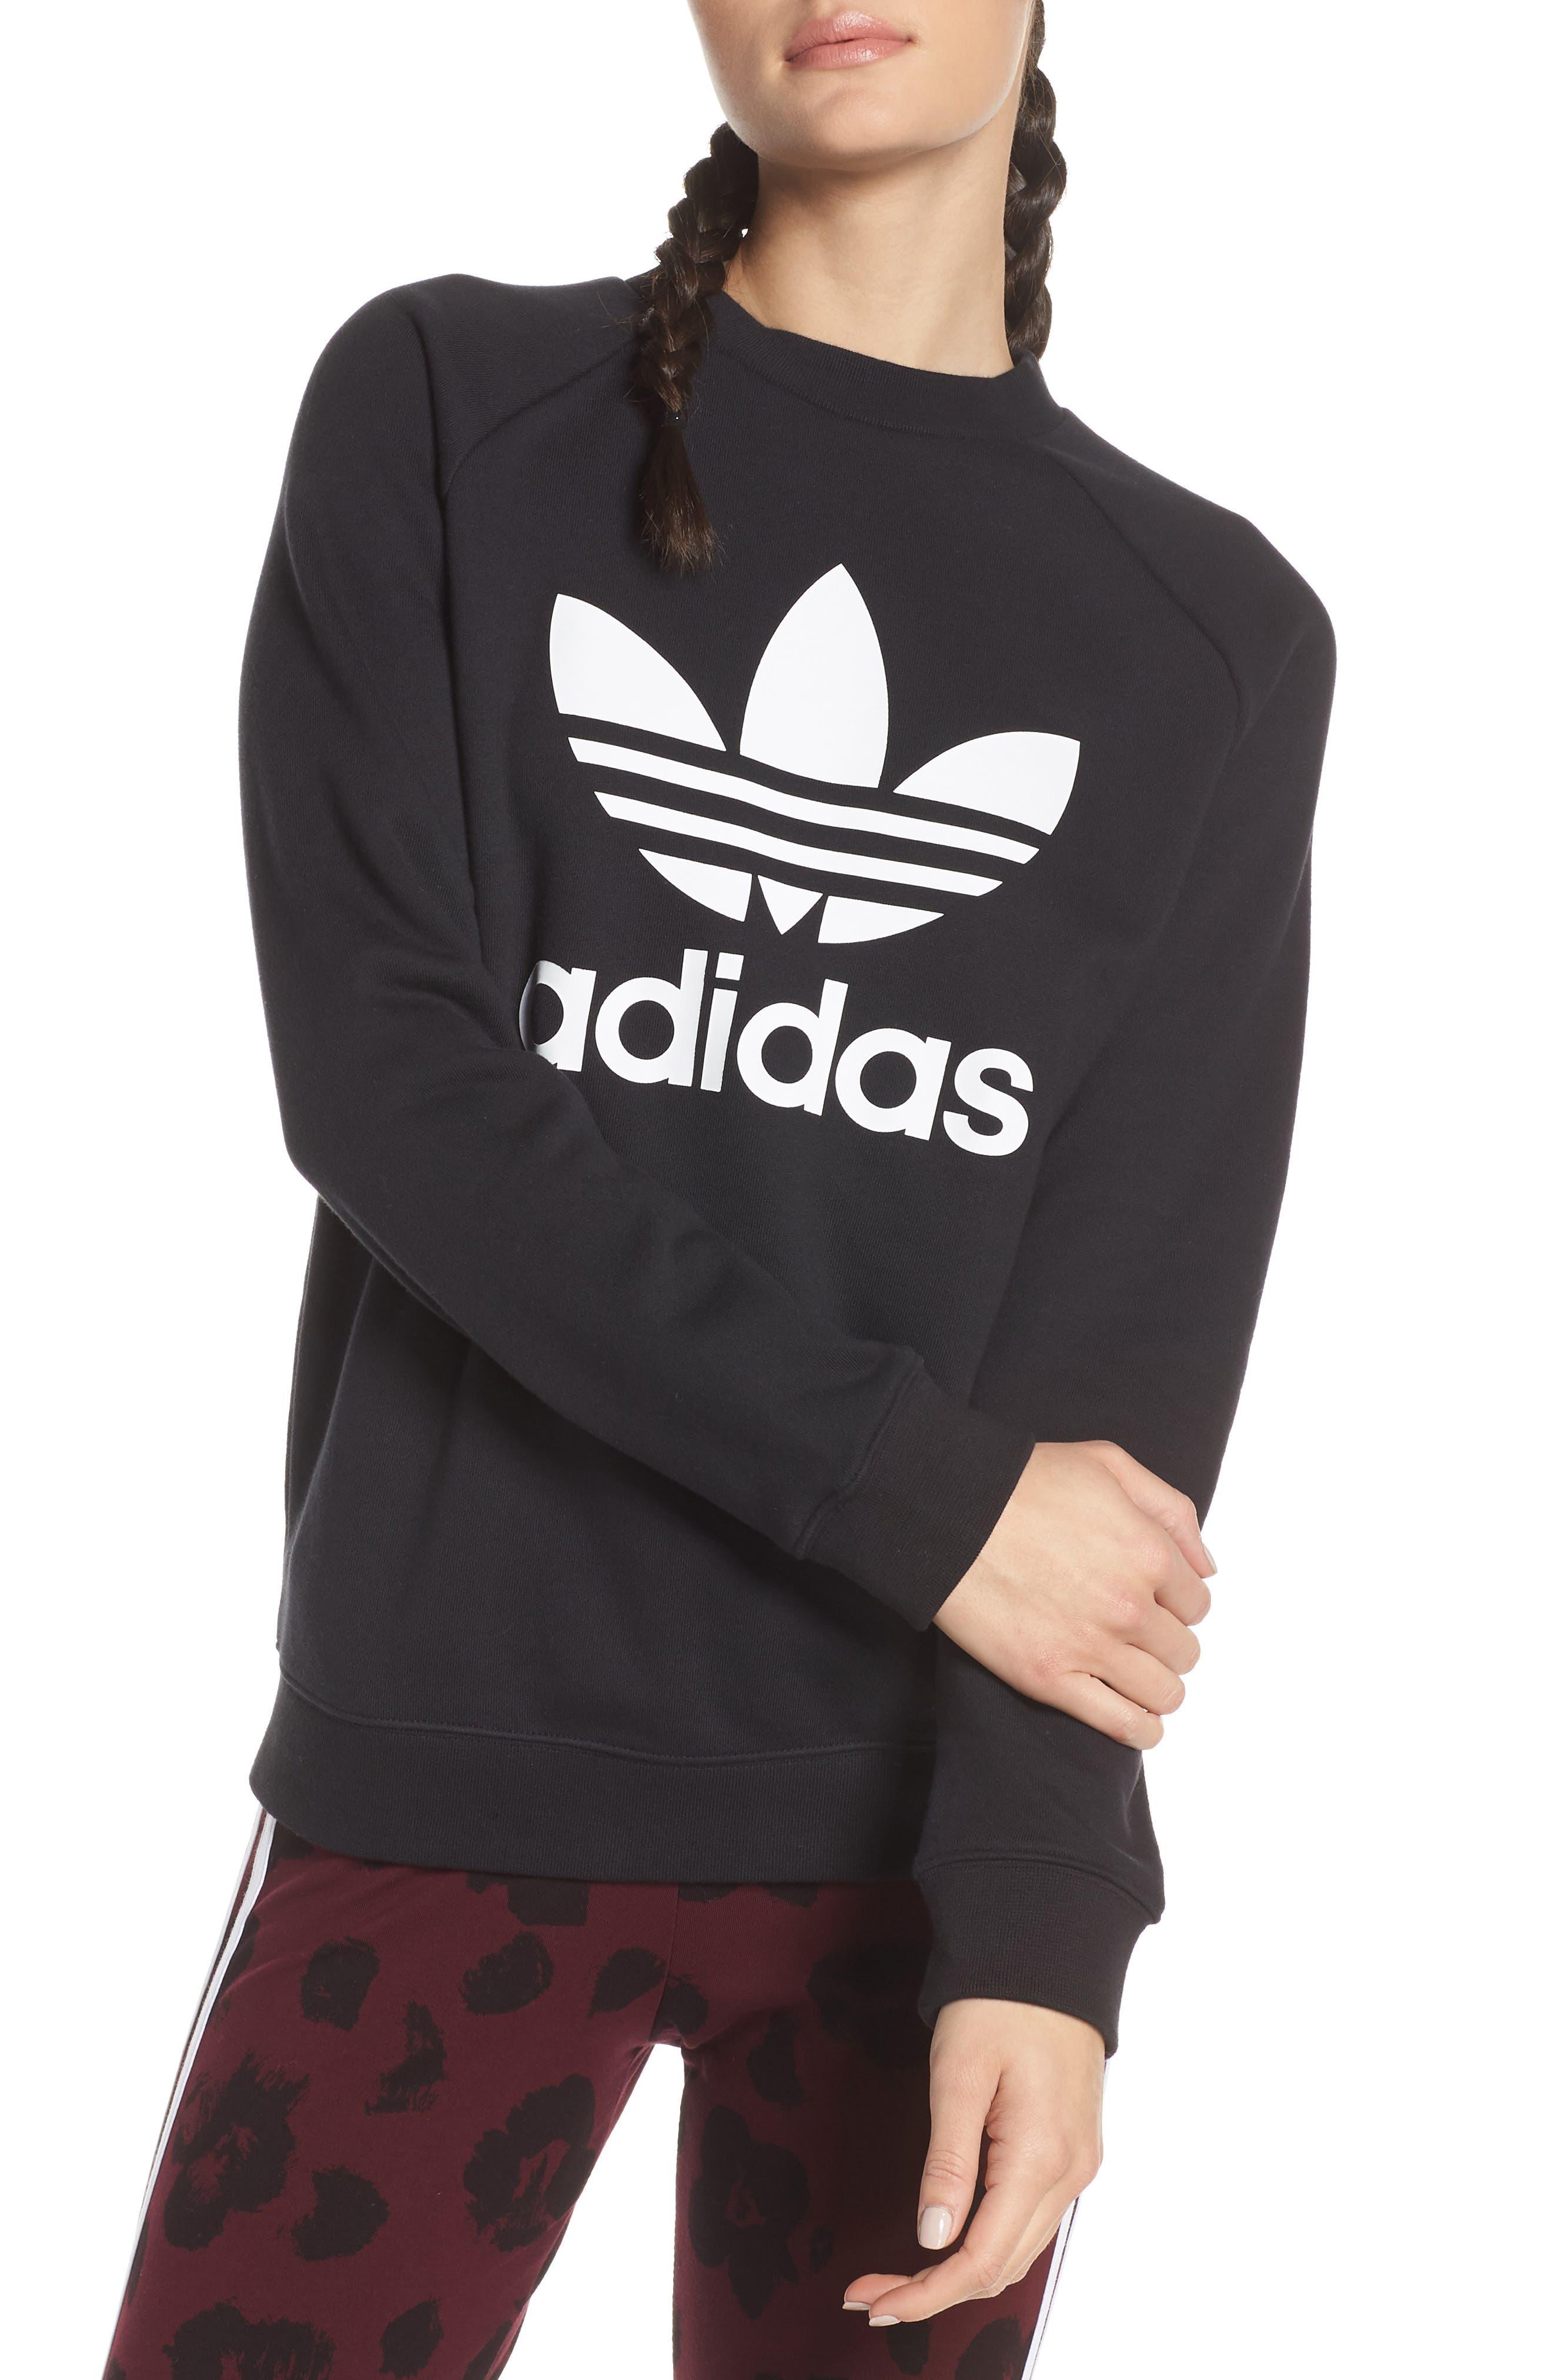 ADIDAS ORIGINALS Trefoil Sweatshirt, Main, color, 001